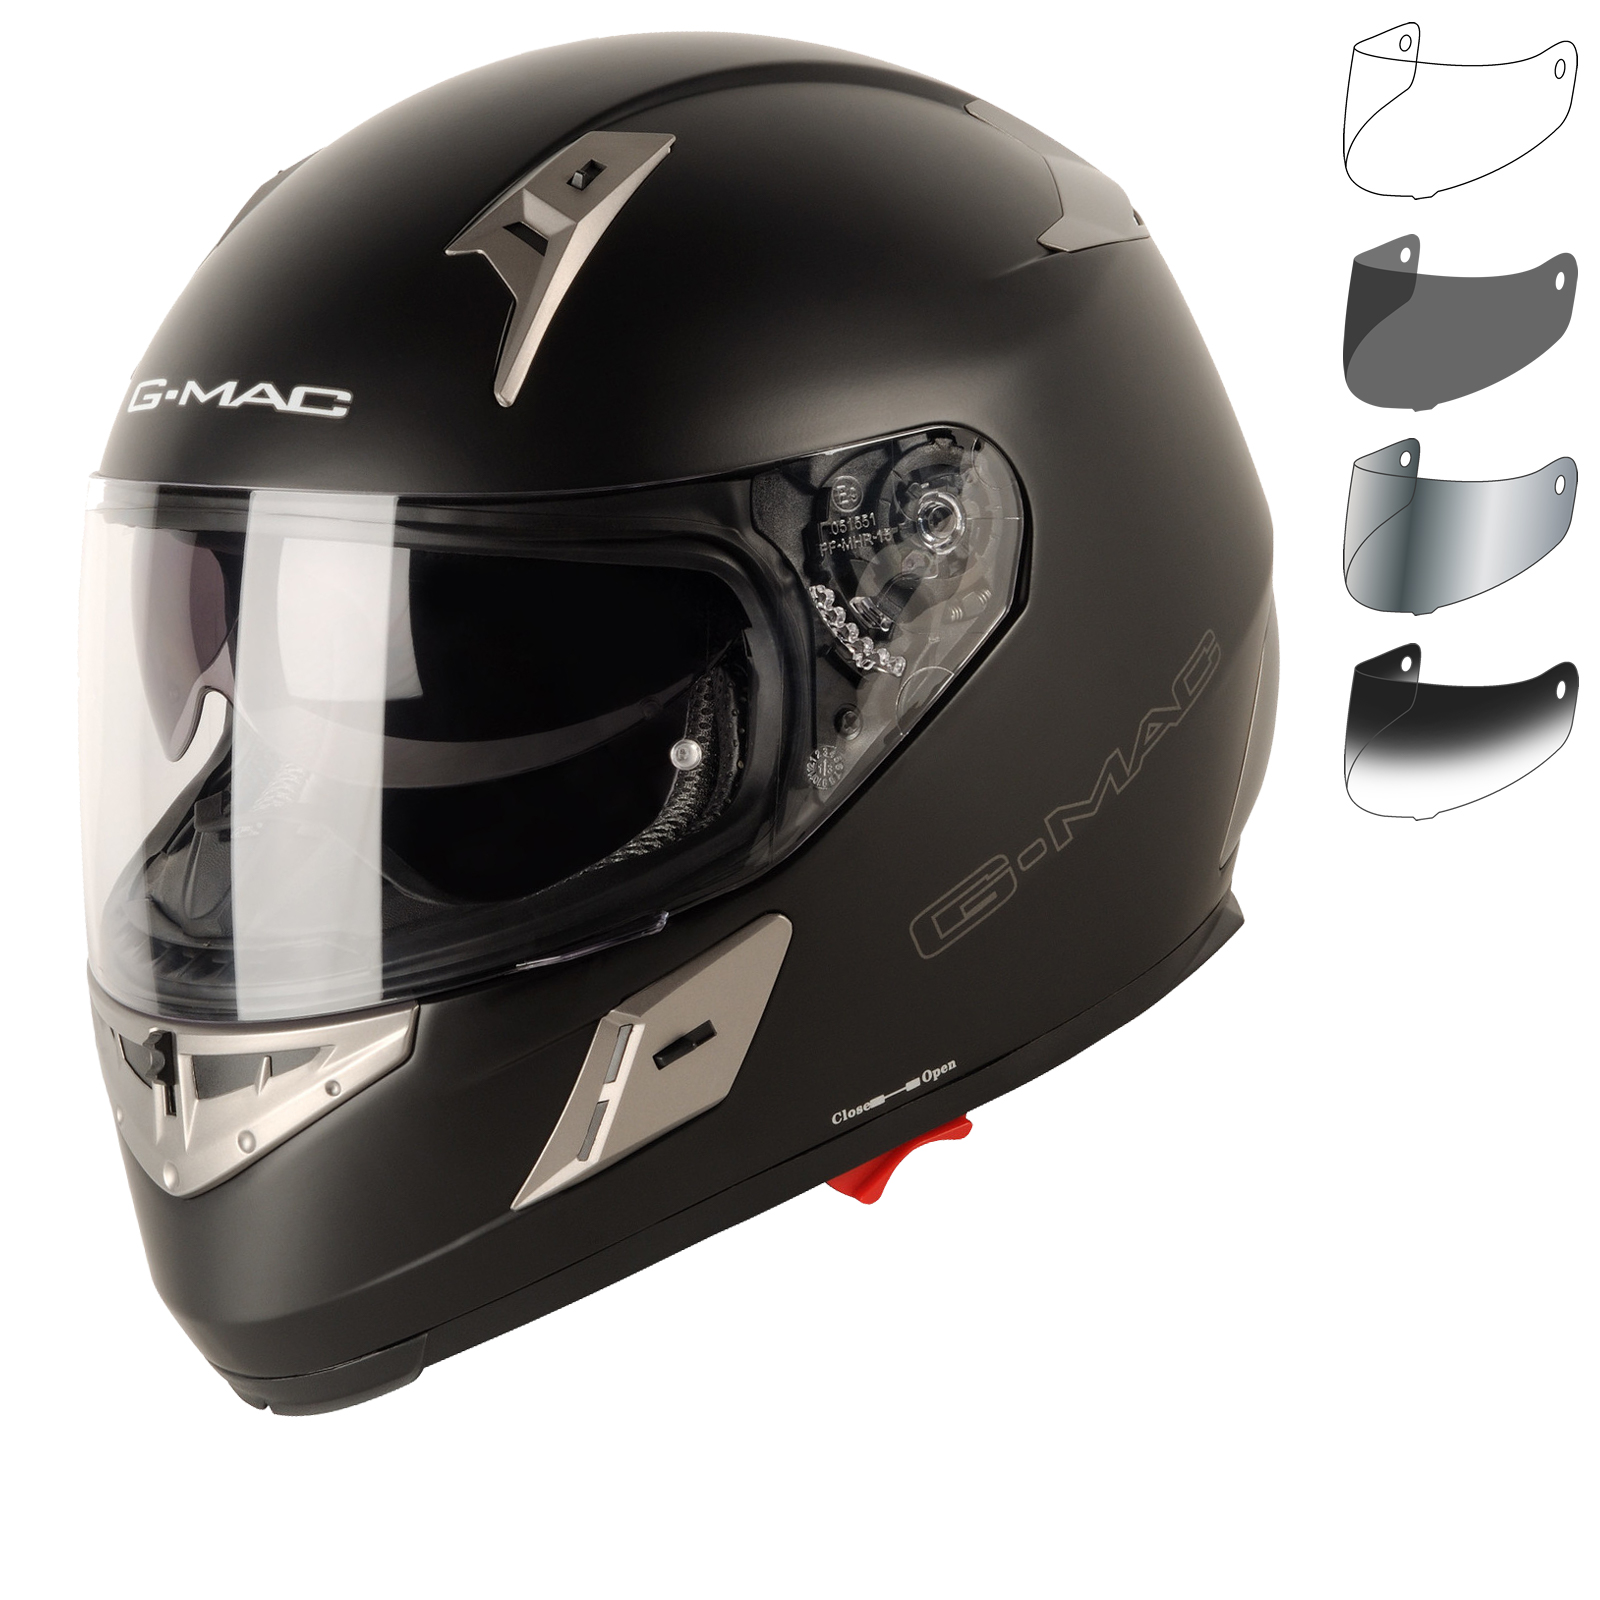 Helmet G-mac Renegade Satin Black